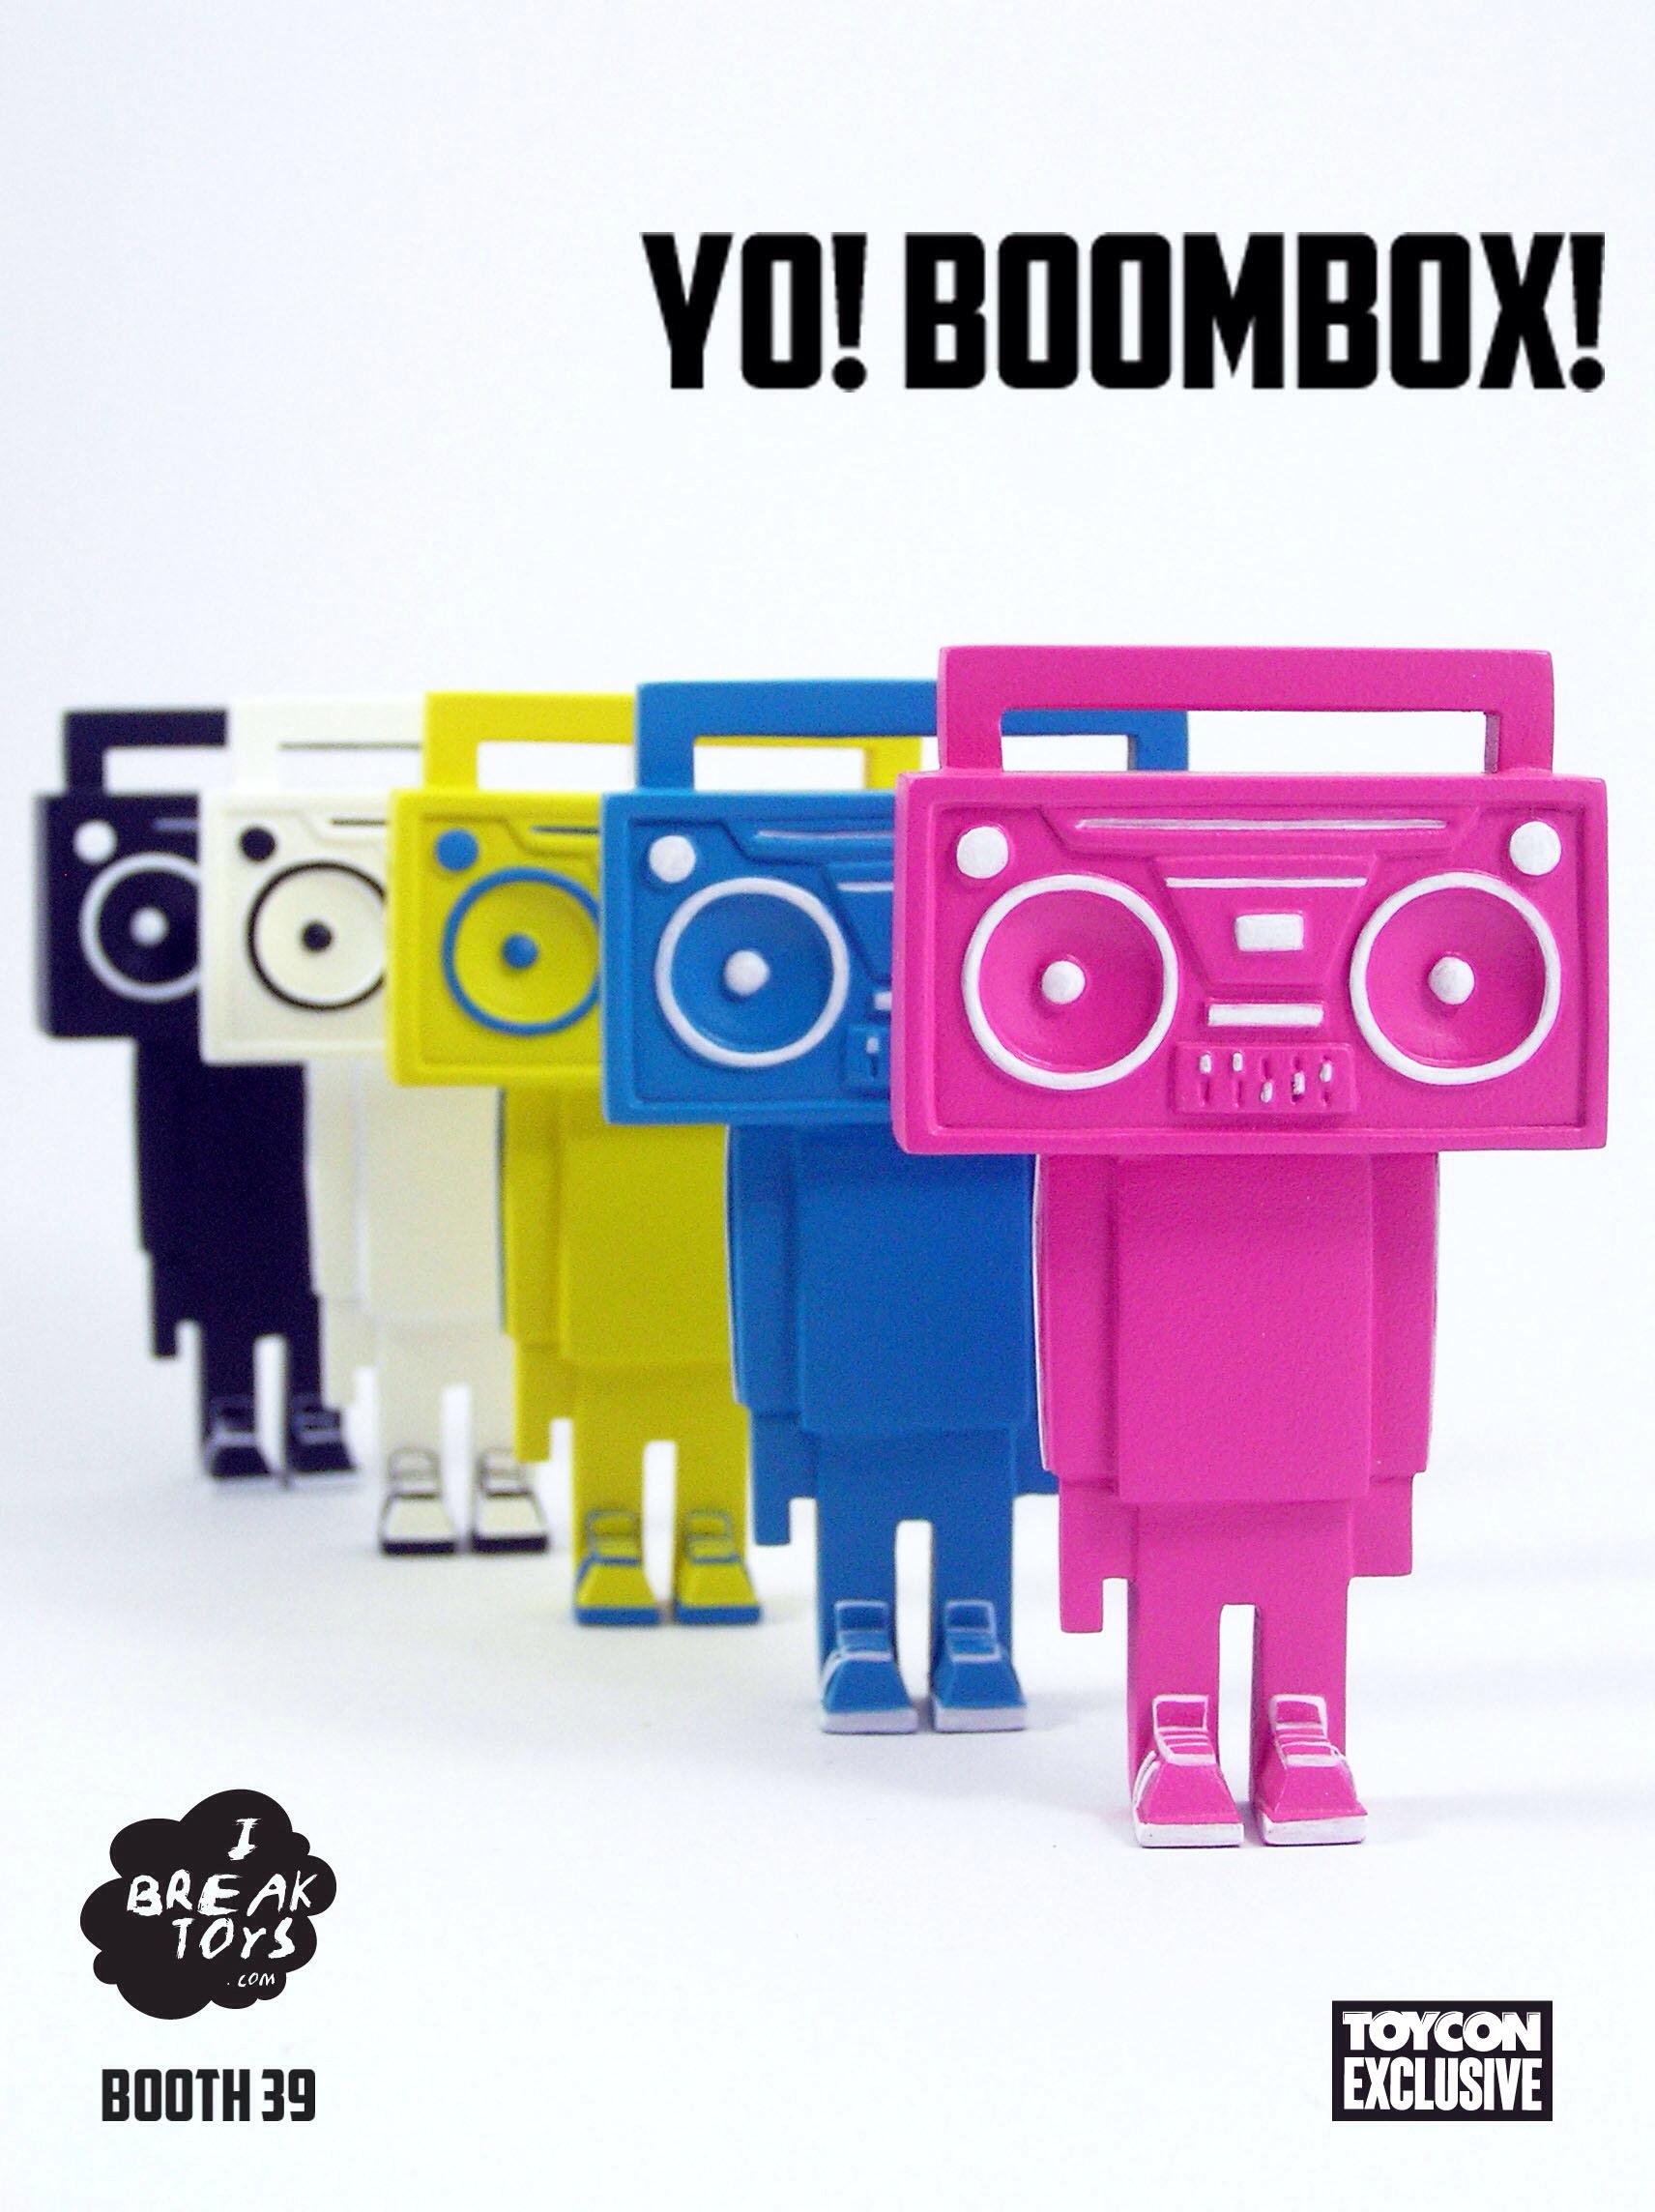 I Break Toys Yo! boombox!